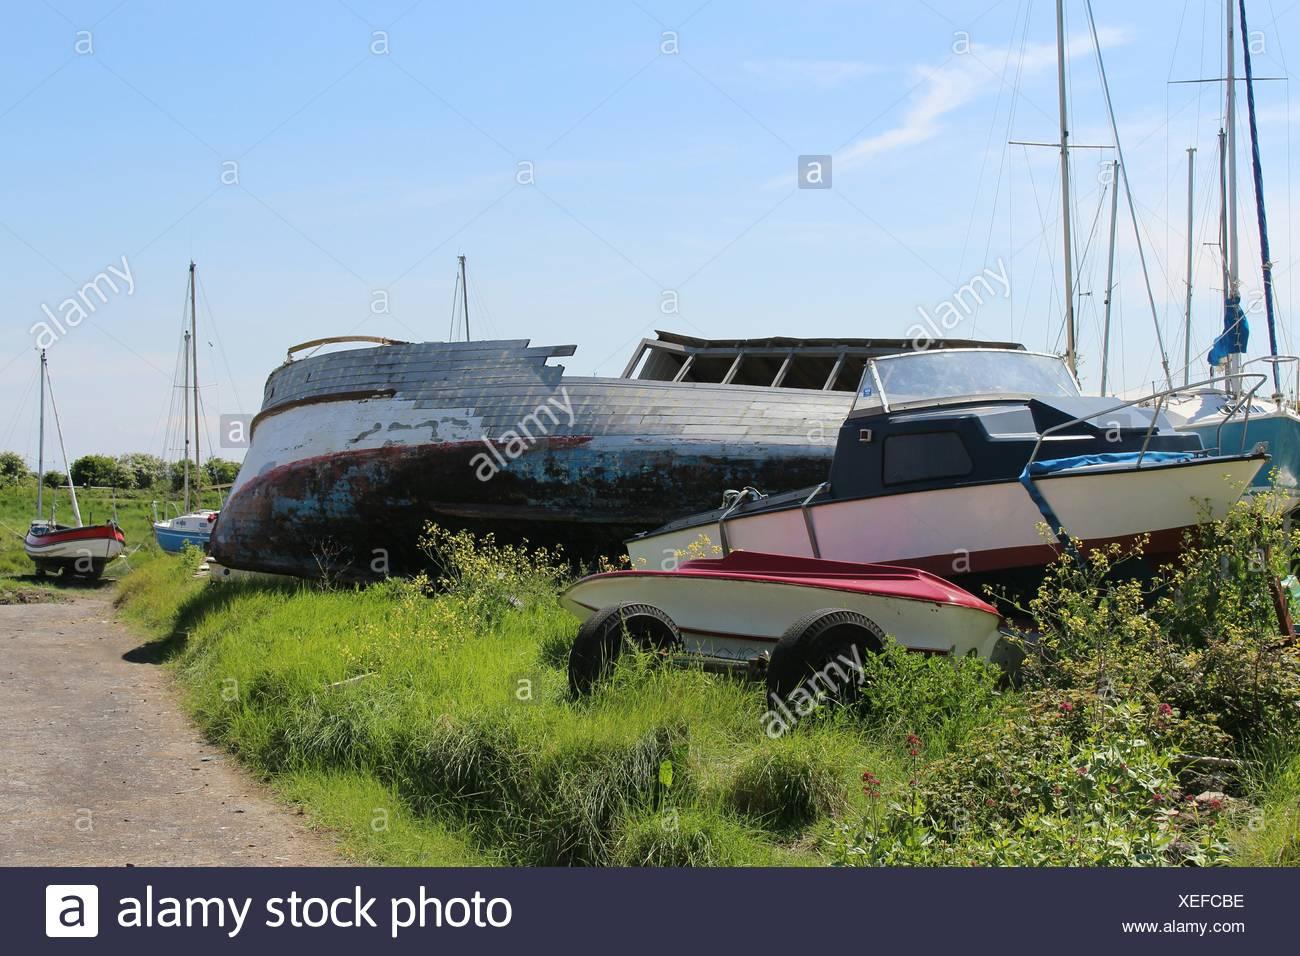 Old Boats In Junkyard - Stock Image